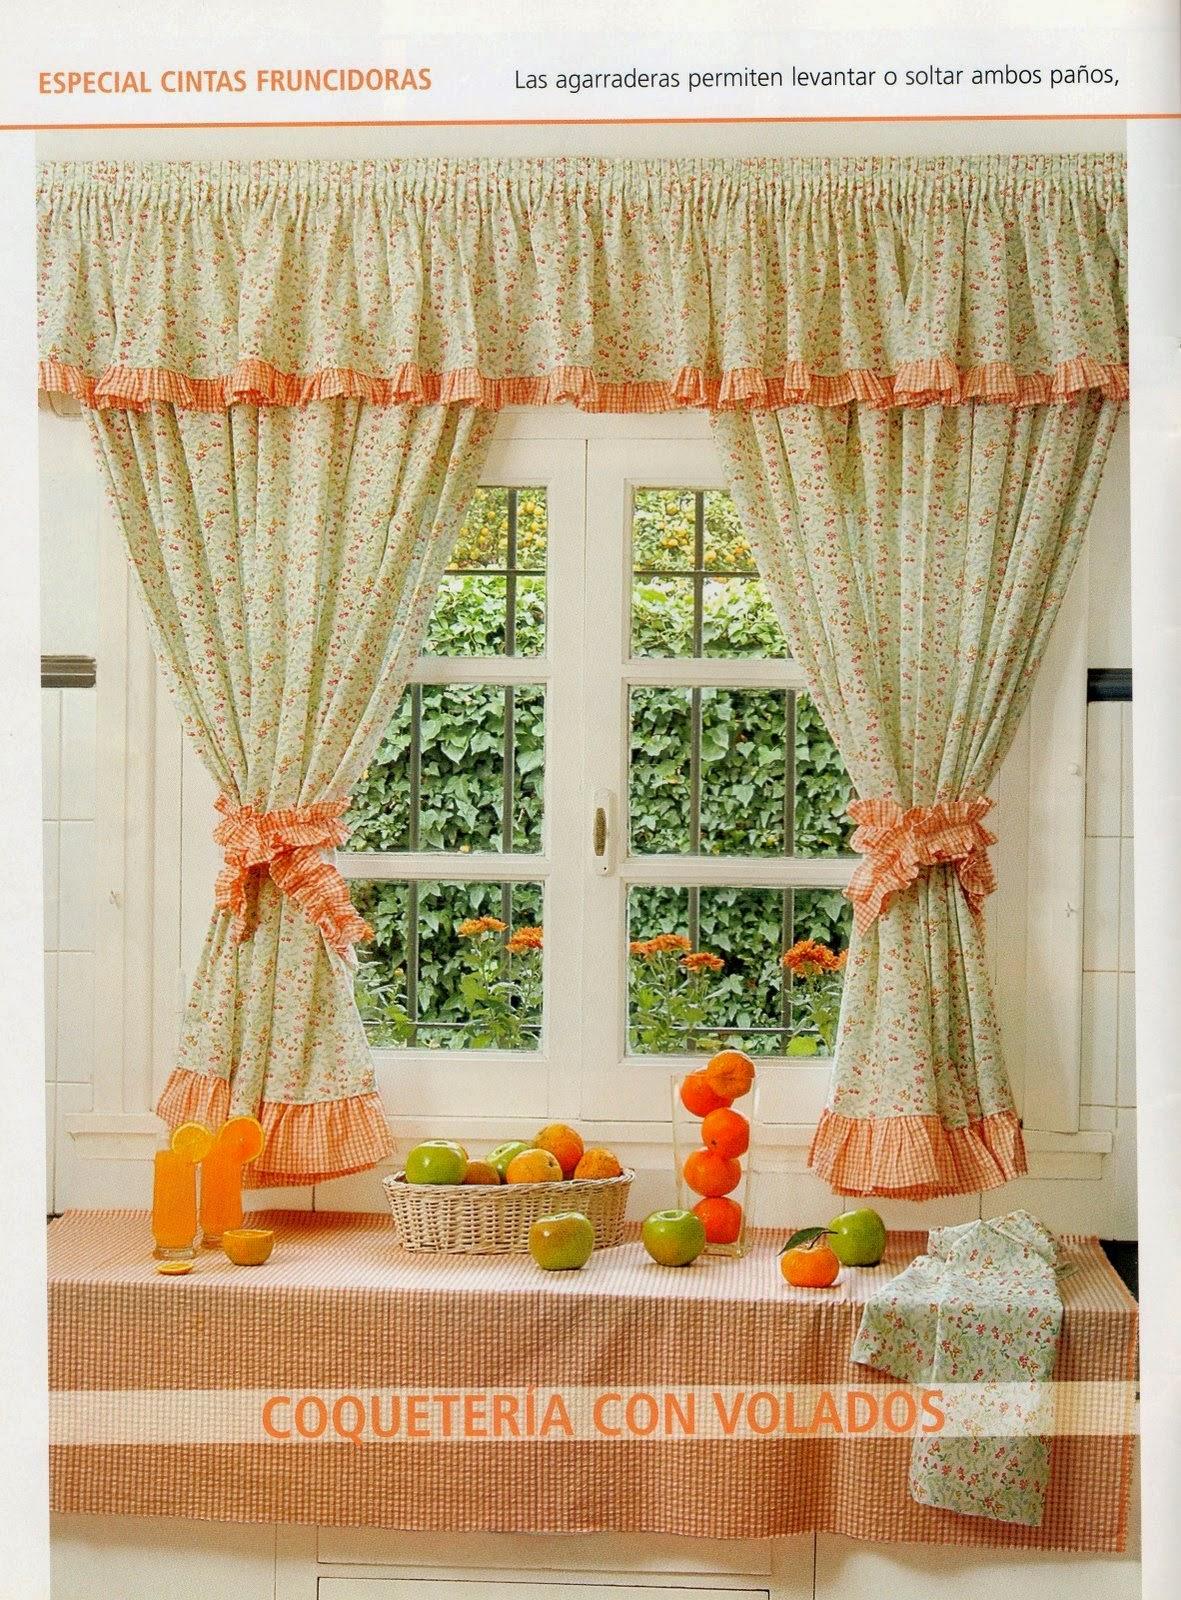 Como hacer cortinas paso a paso revistas de manualidades - Manualidades en tela paso a paso ...